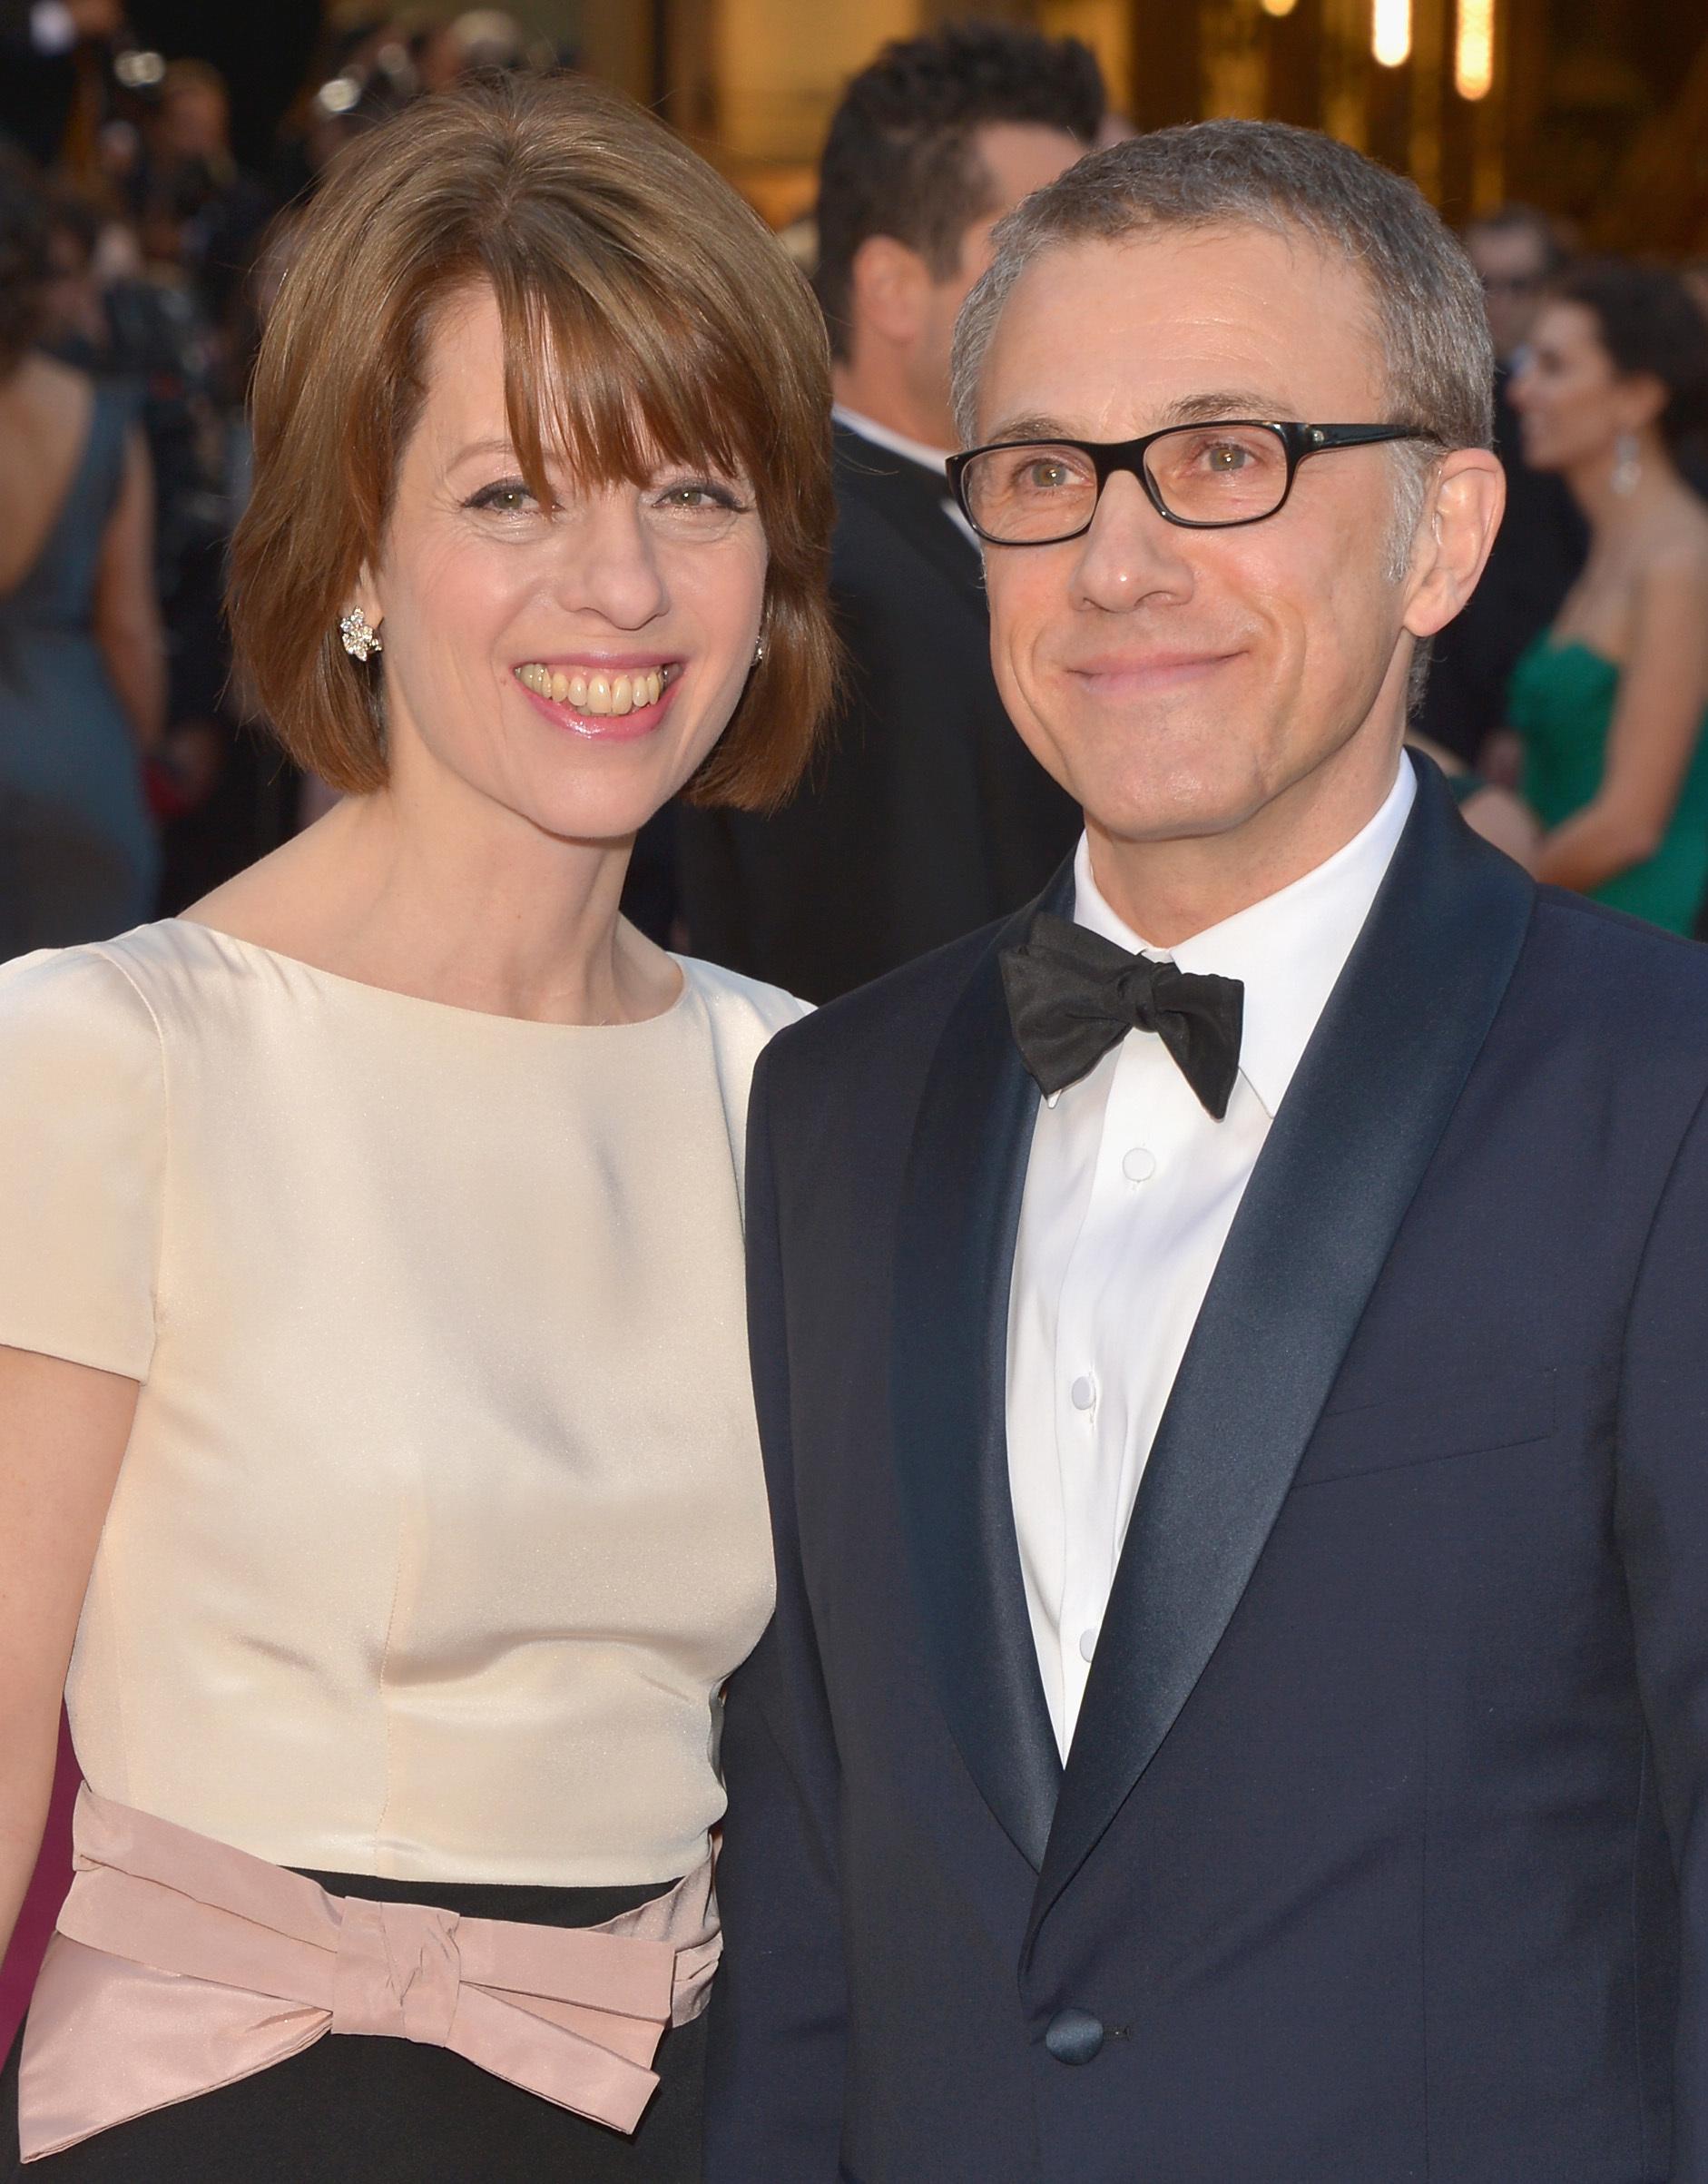 Christoph Waltz Judith Holste Oscars 2013